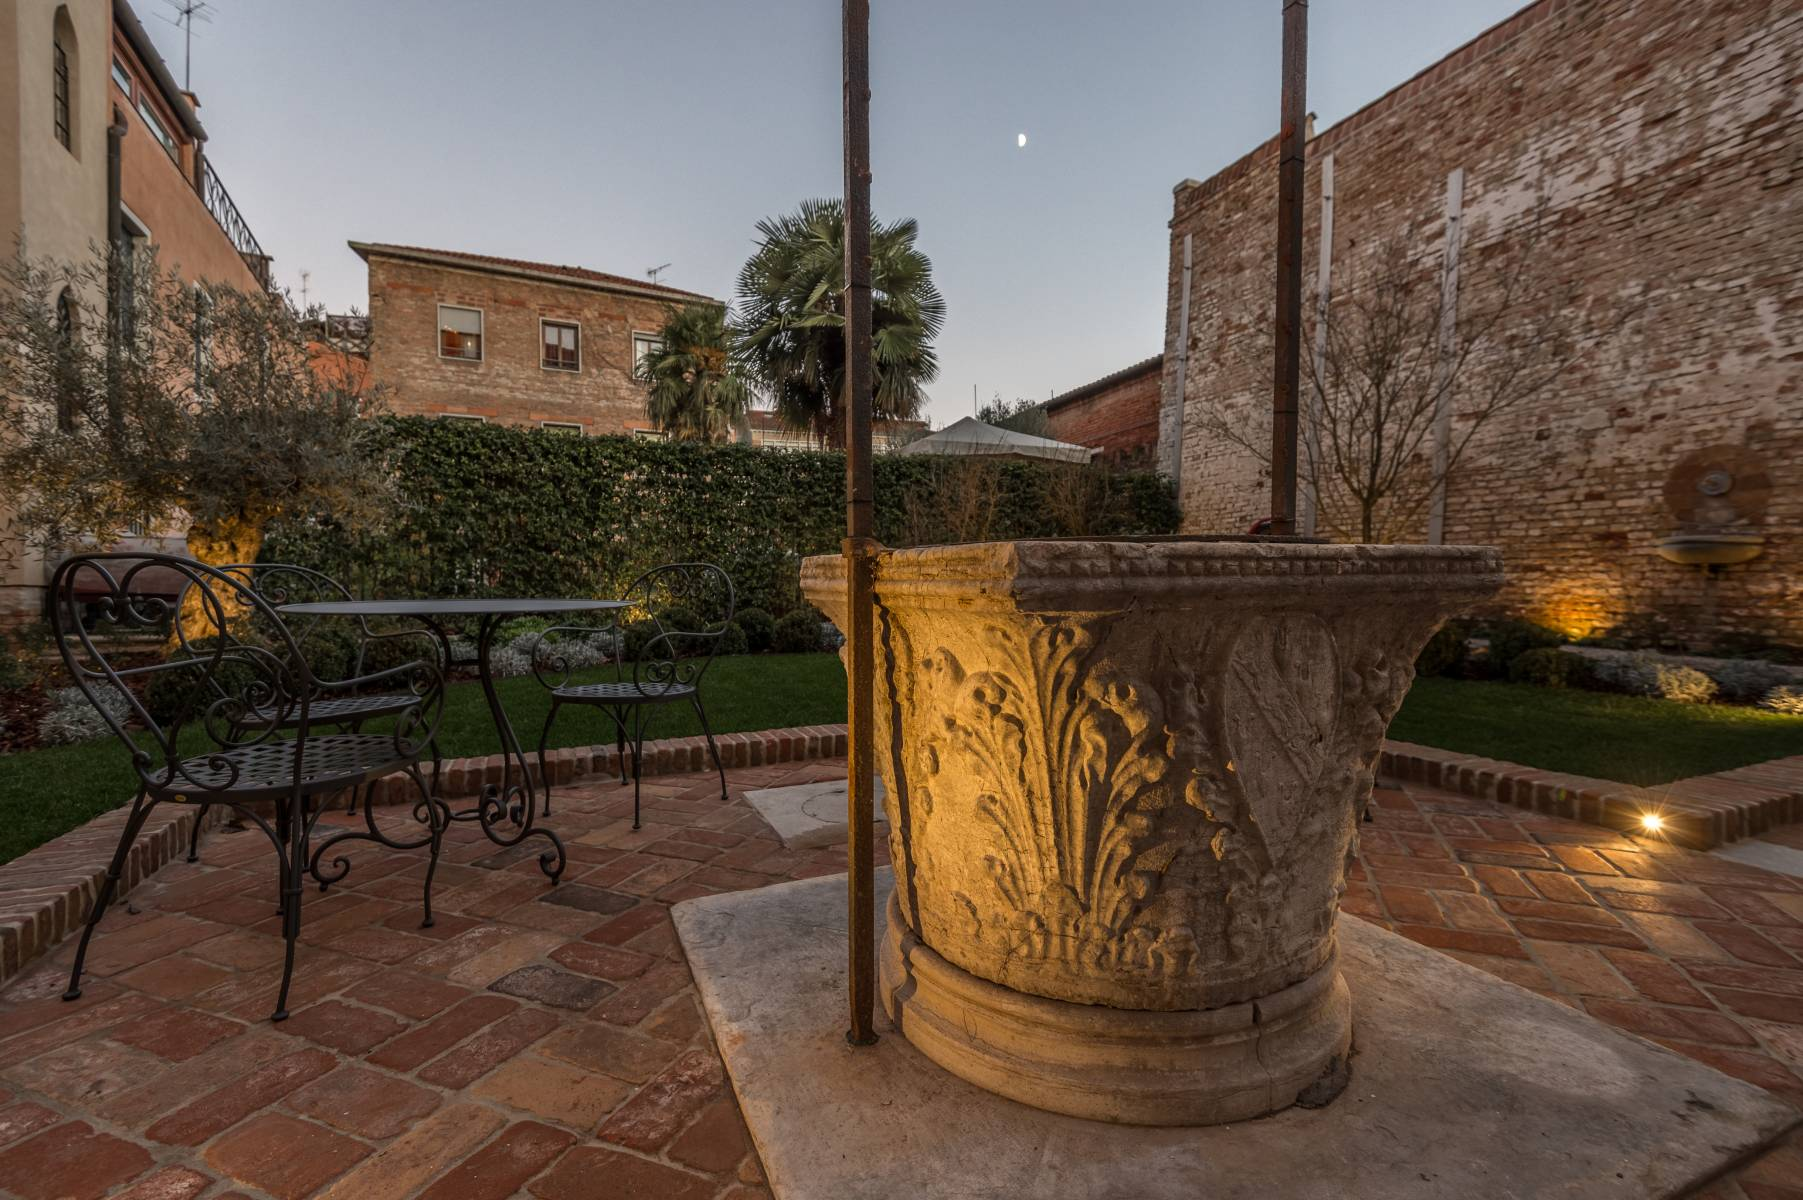 The Garden Venice Hotel - Hotel Nani Mocenigo Palace on the San ...